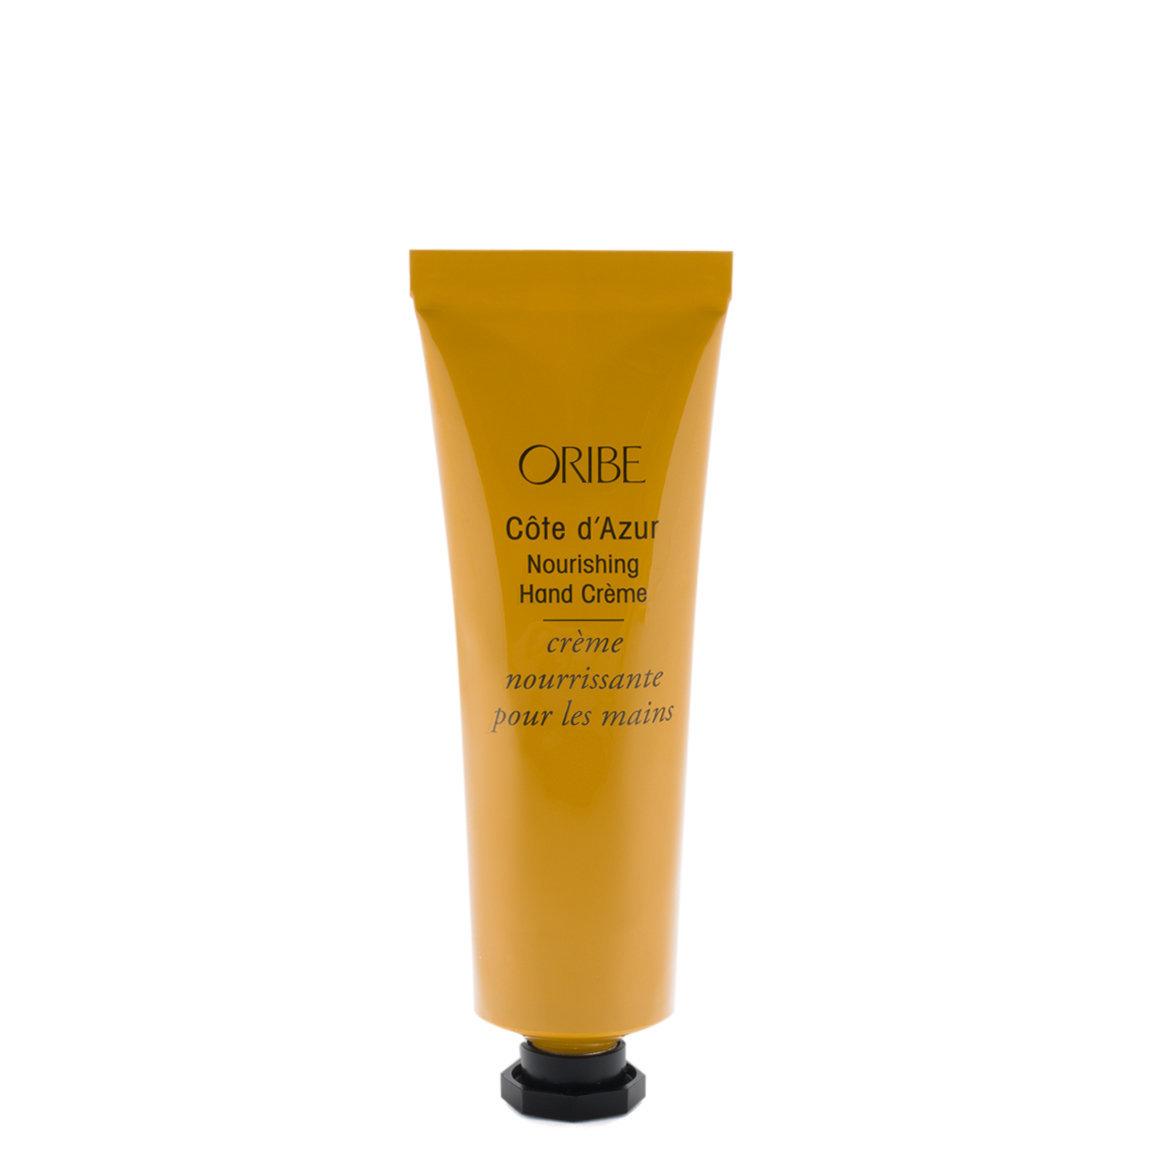 Oribe Cote d'Azur Nourishing Hand Creme 1 oz product swatch.